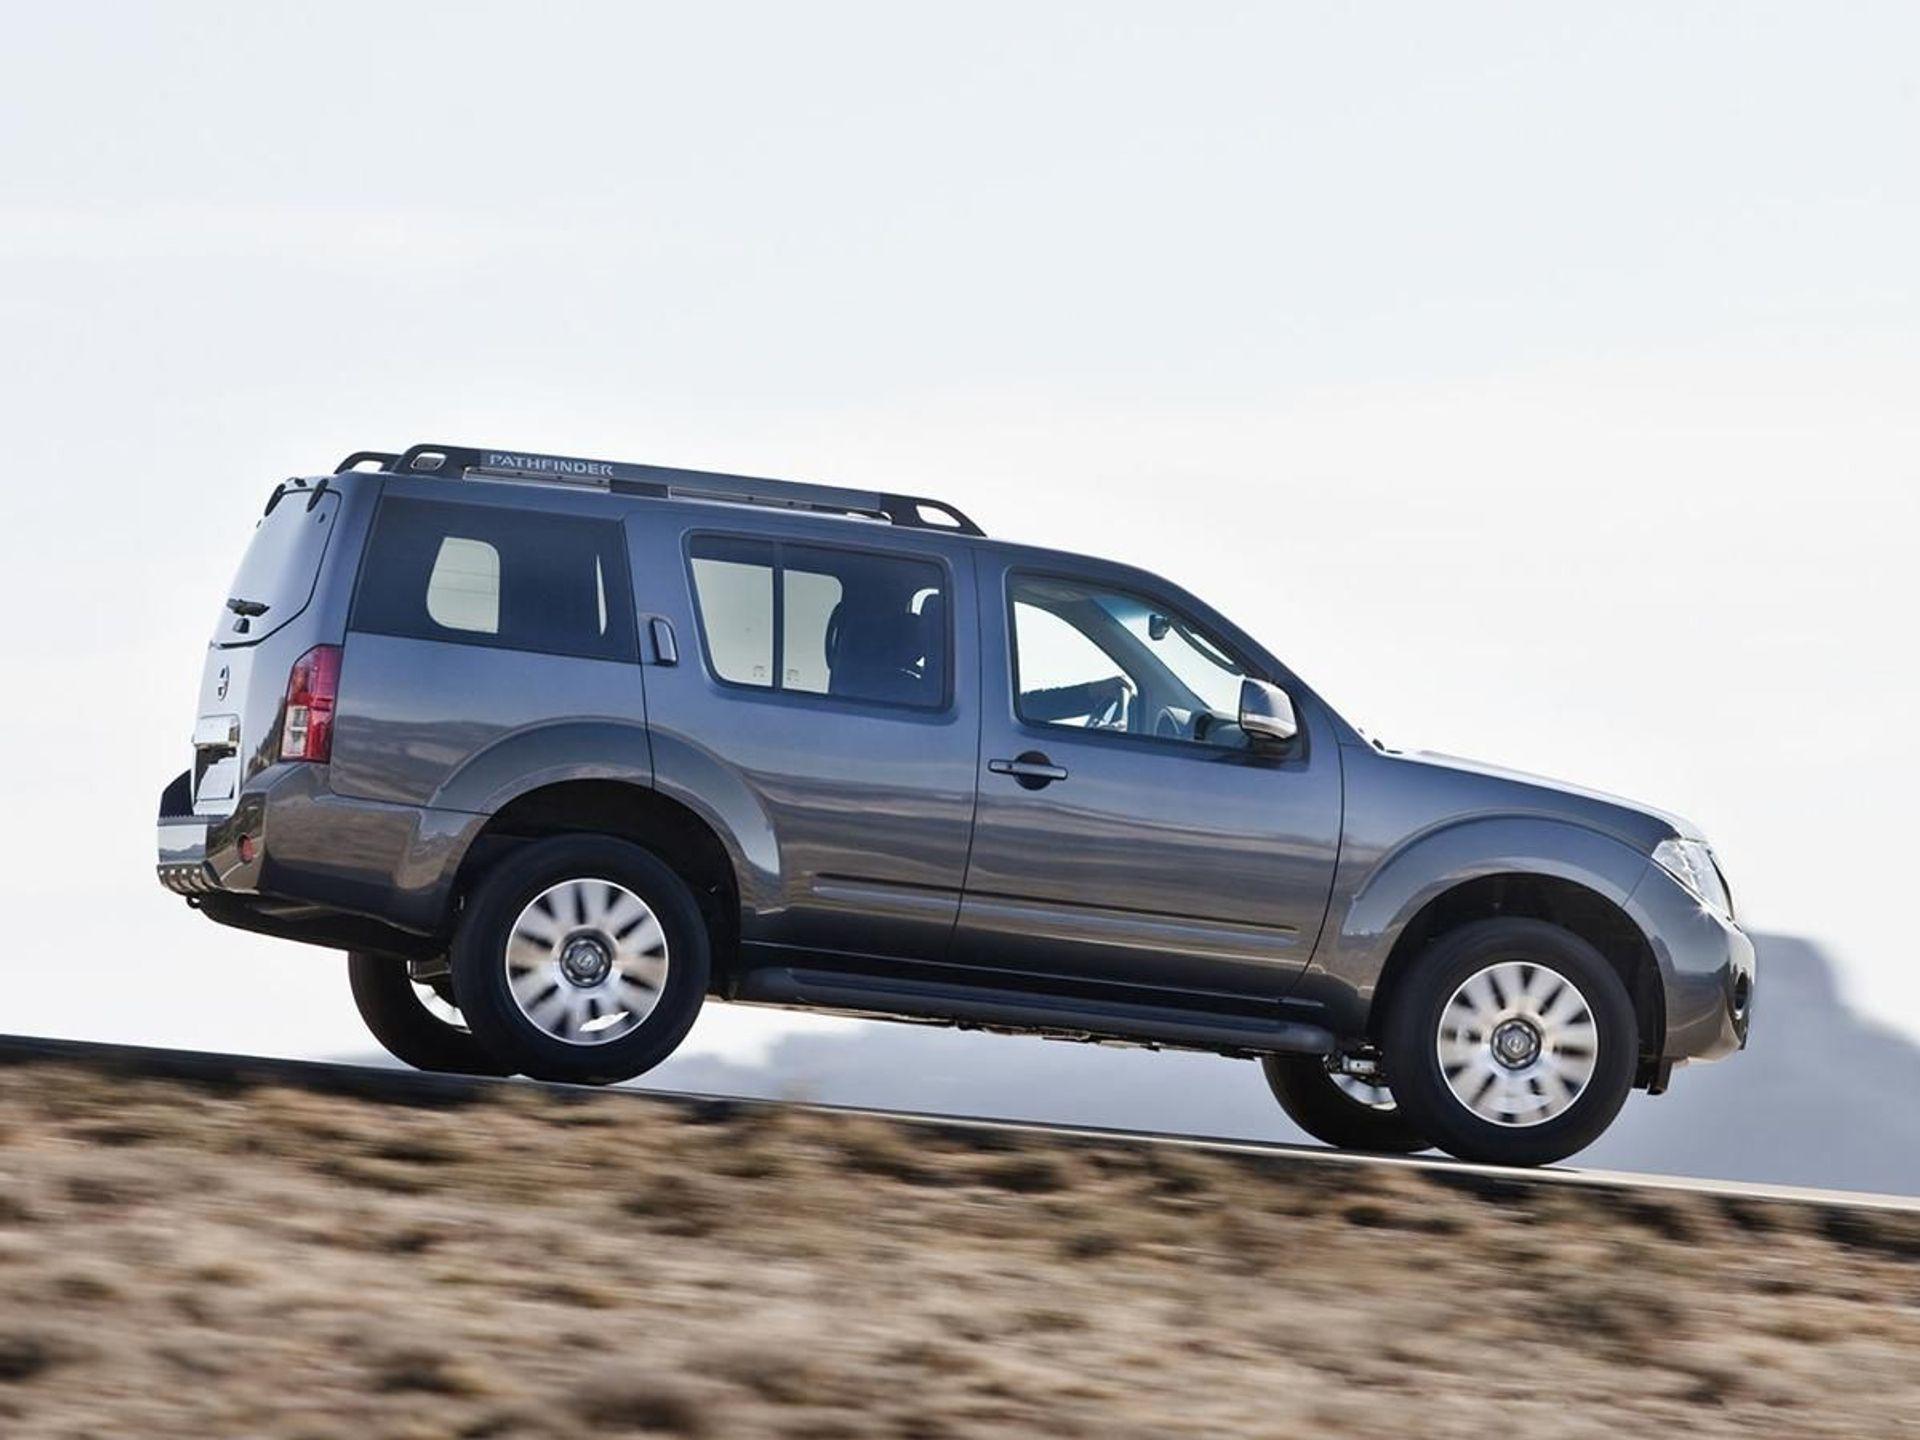 Nissan Pathfinder  image